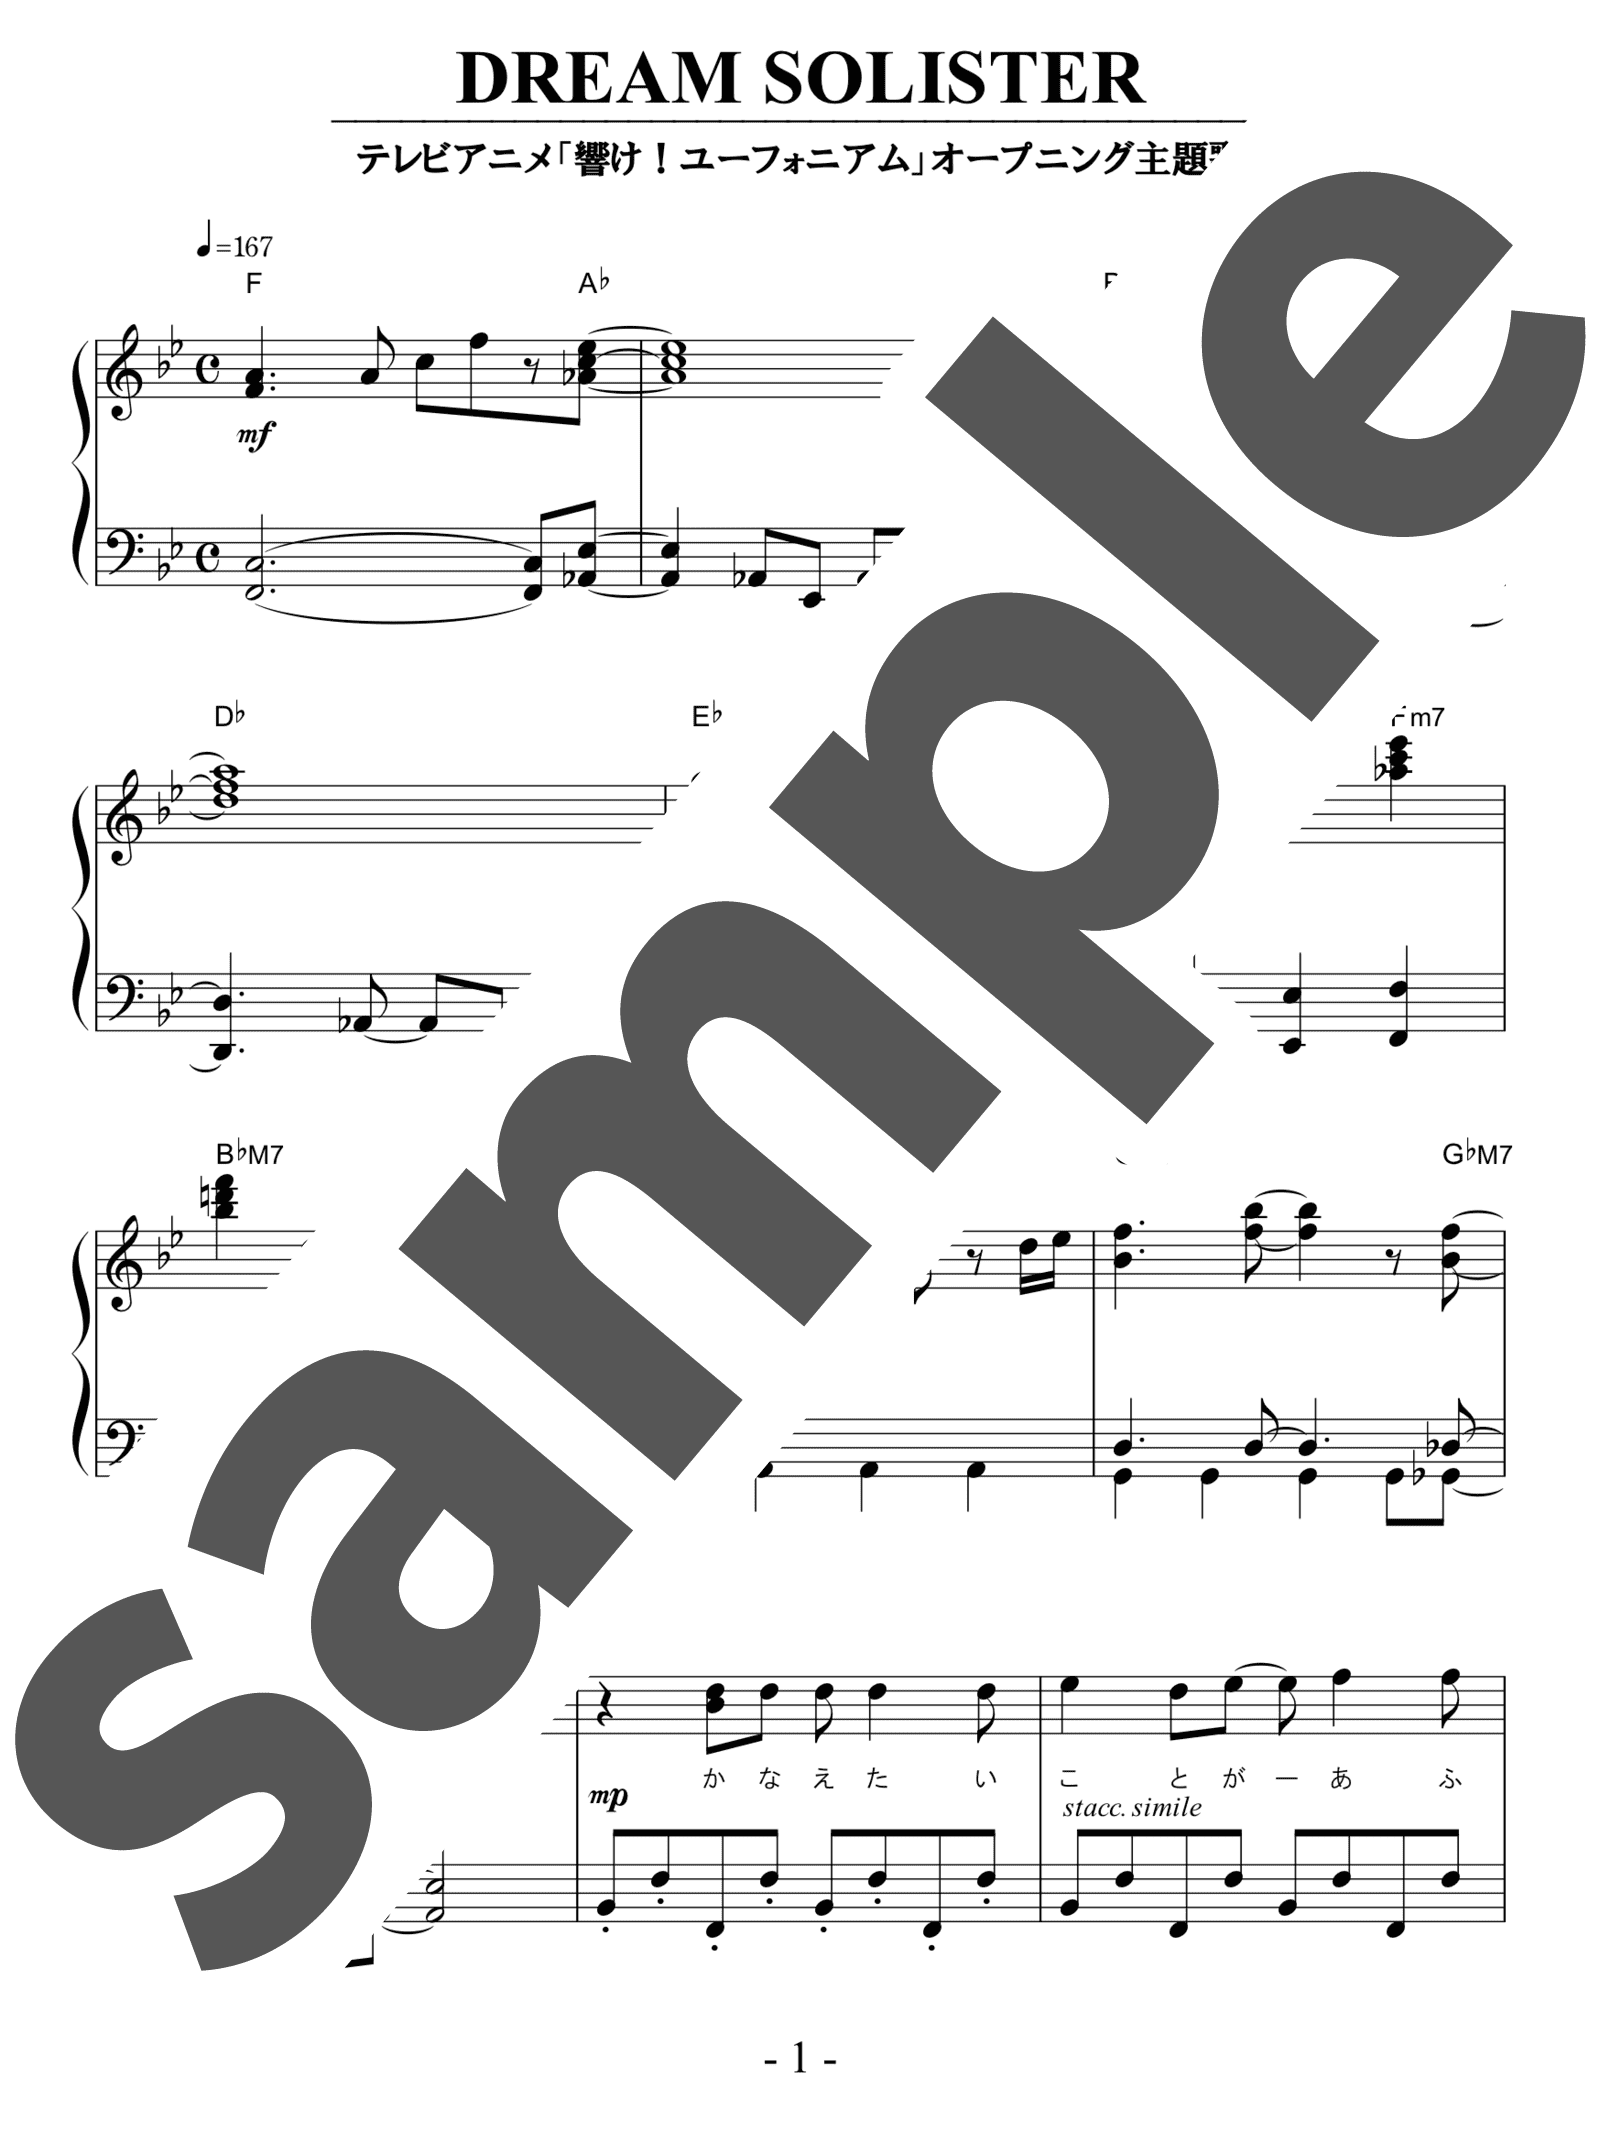 「DREAM SOLISTER」のサンプル楽譜